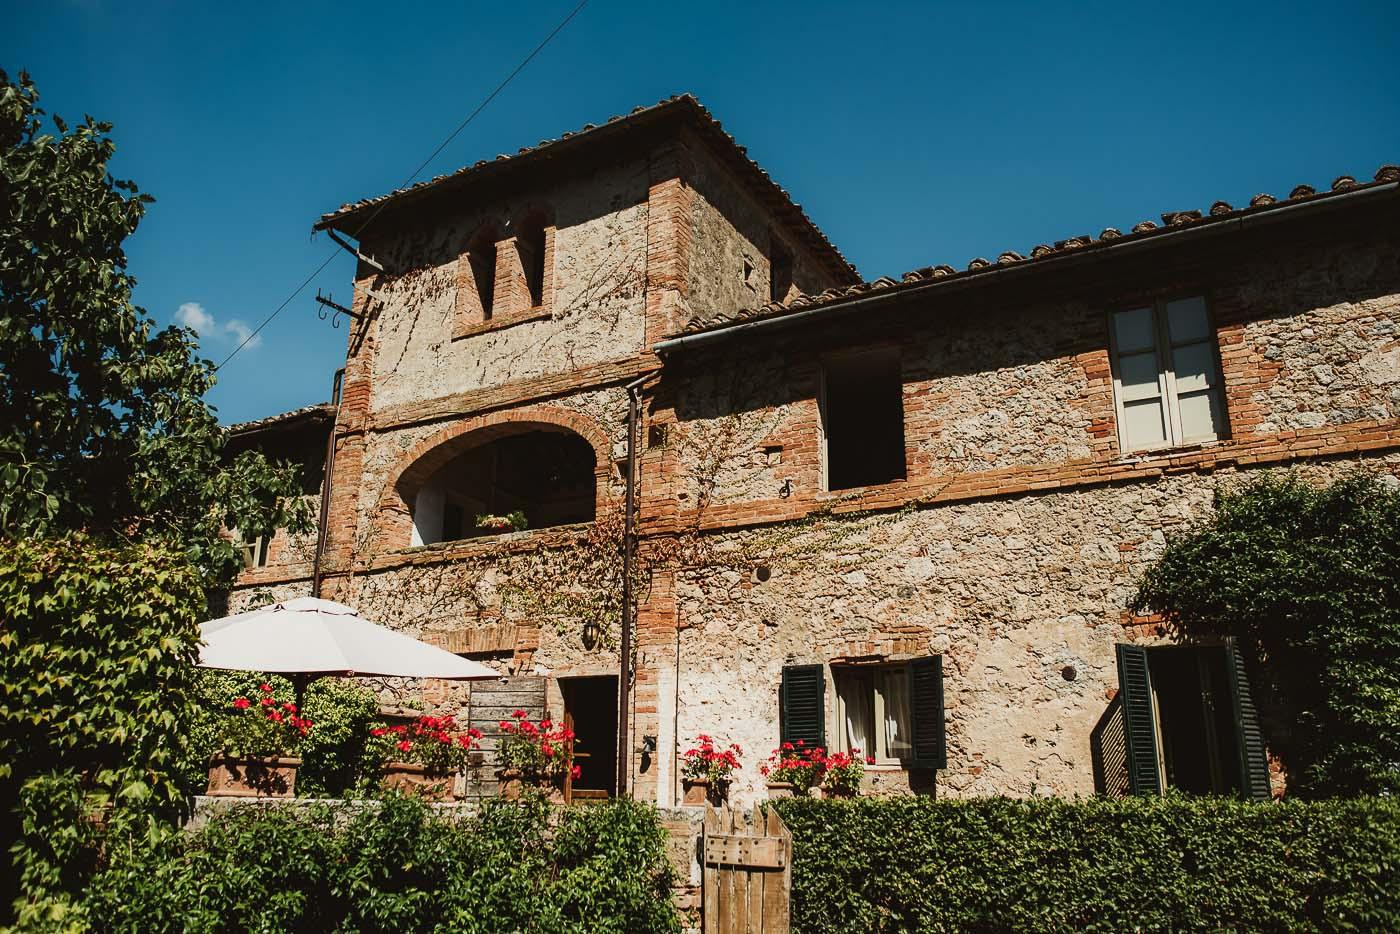 Relaxed-wedding-borgo-stomennano-1007